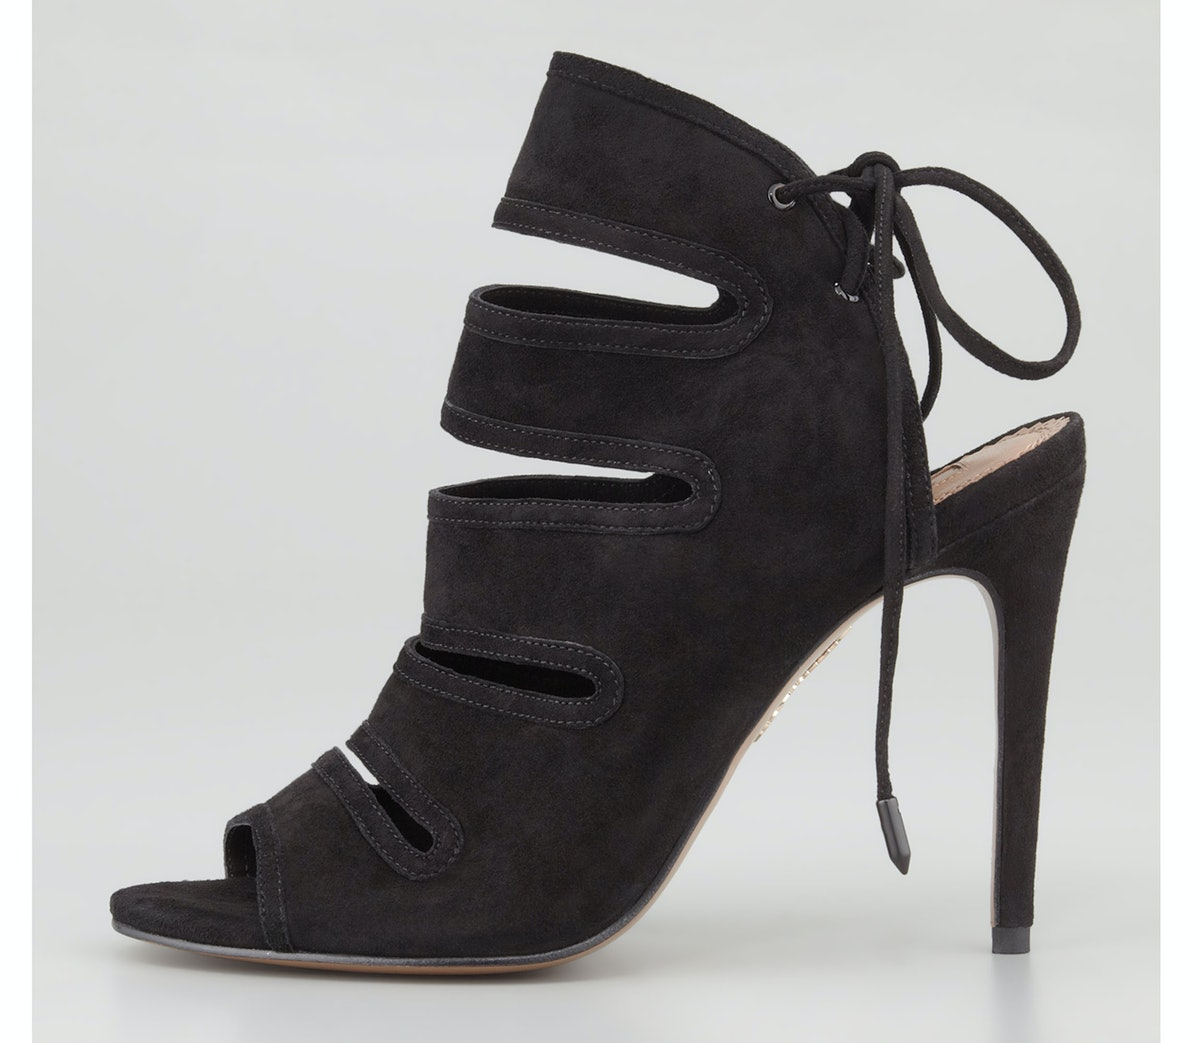 fass-open-toe-booties-09-aquazurra